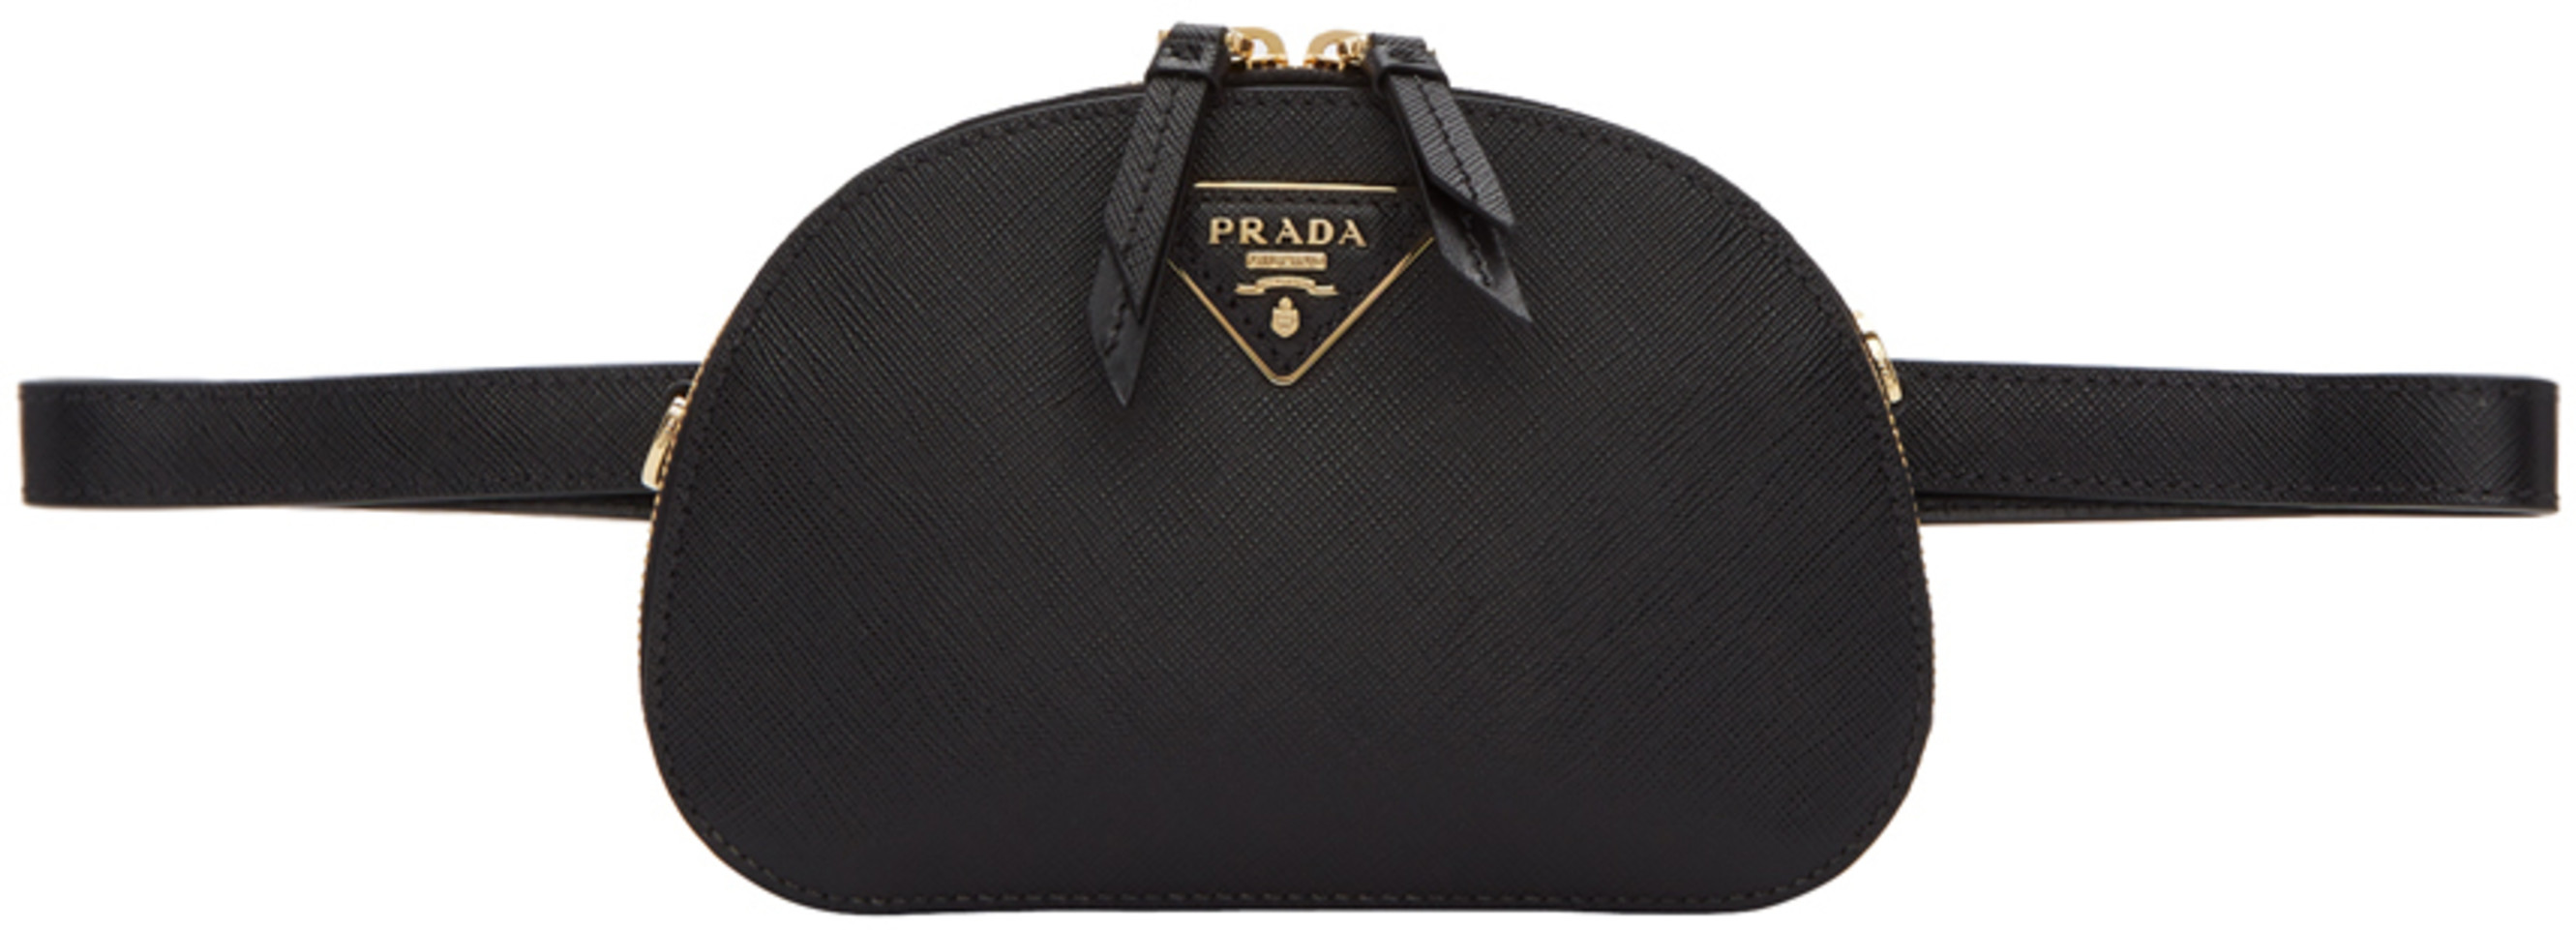 2d1c831dc79 Prada for Women SS19 Collection | SSENSE